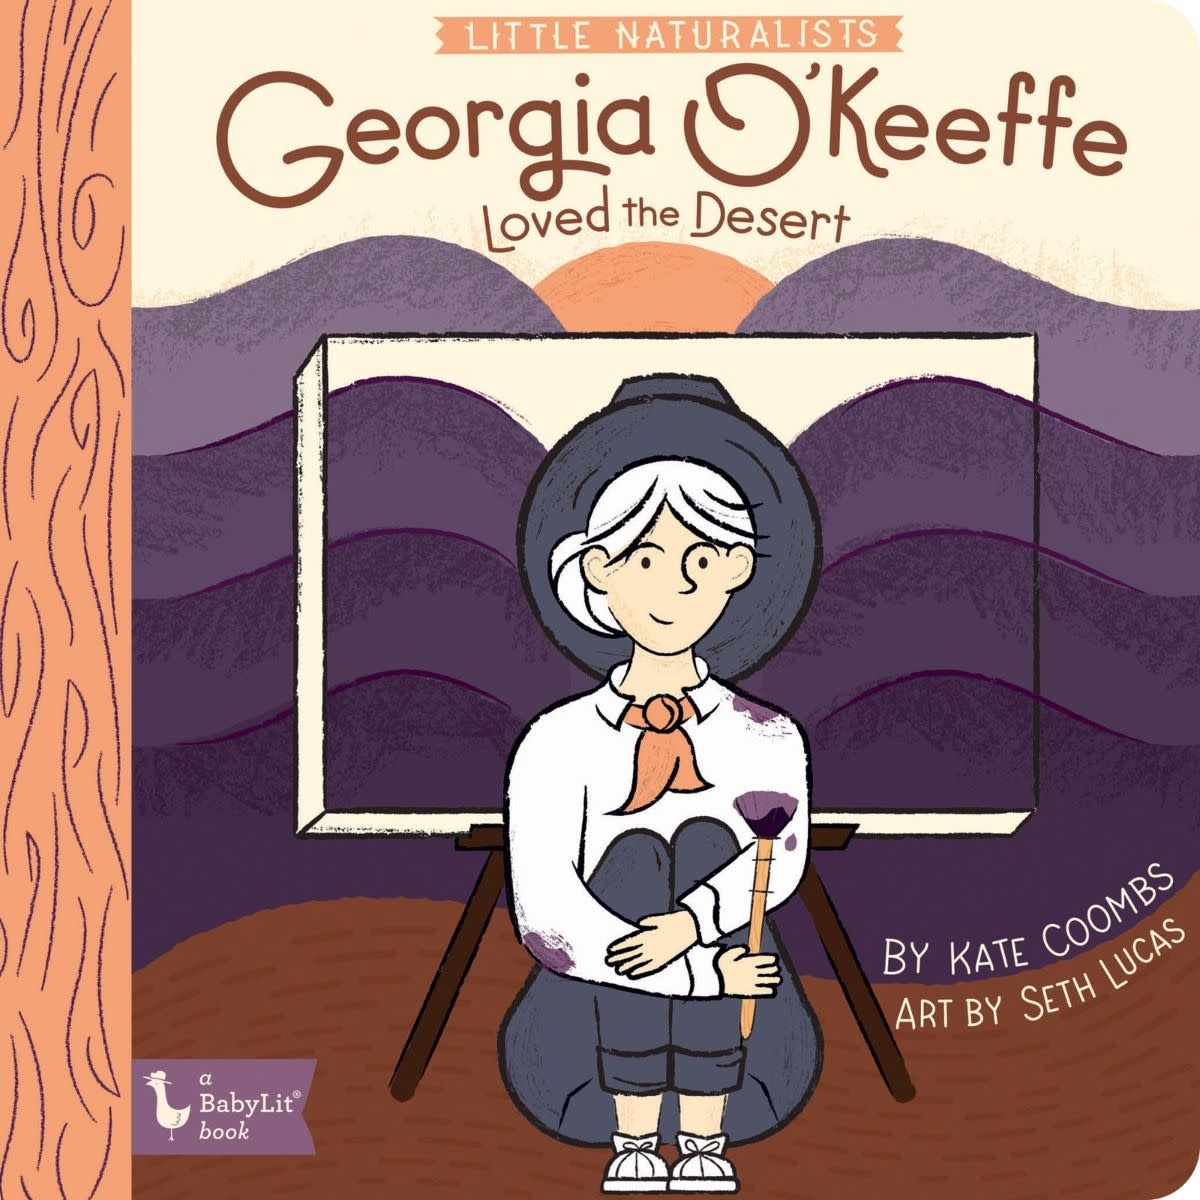 Little Naturalist: Georgia O'Keeffe Loved The Desert